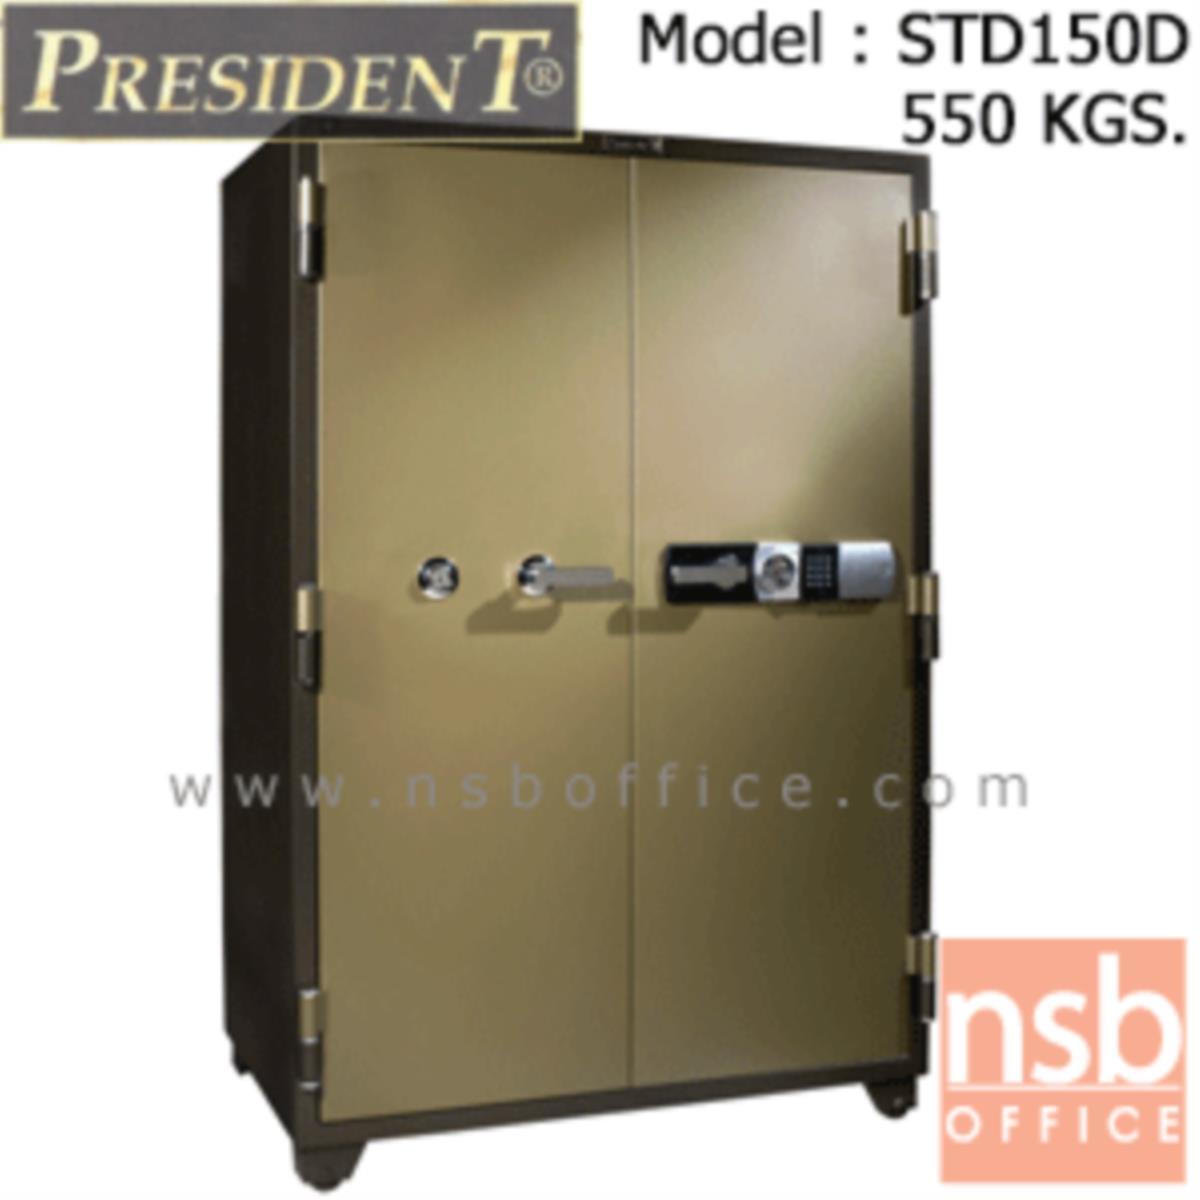 F05A042:ตู้เซฟนิรภัย 2 บานเปิดชนิดดิจิตอล 550 กก.  รุ่น PRESIDENT-STD150D  มี 2 กุญแจ 1 รหัส